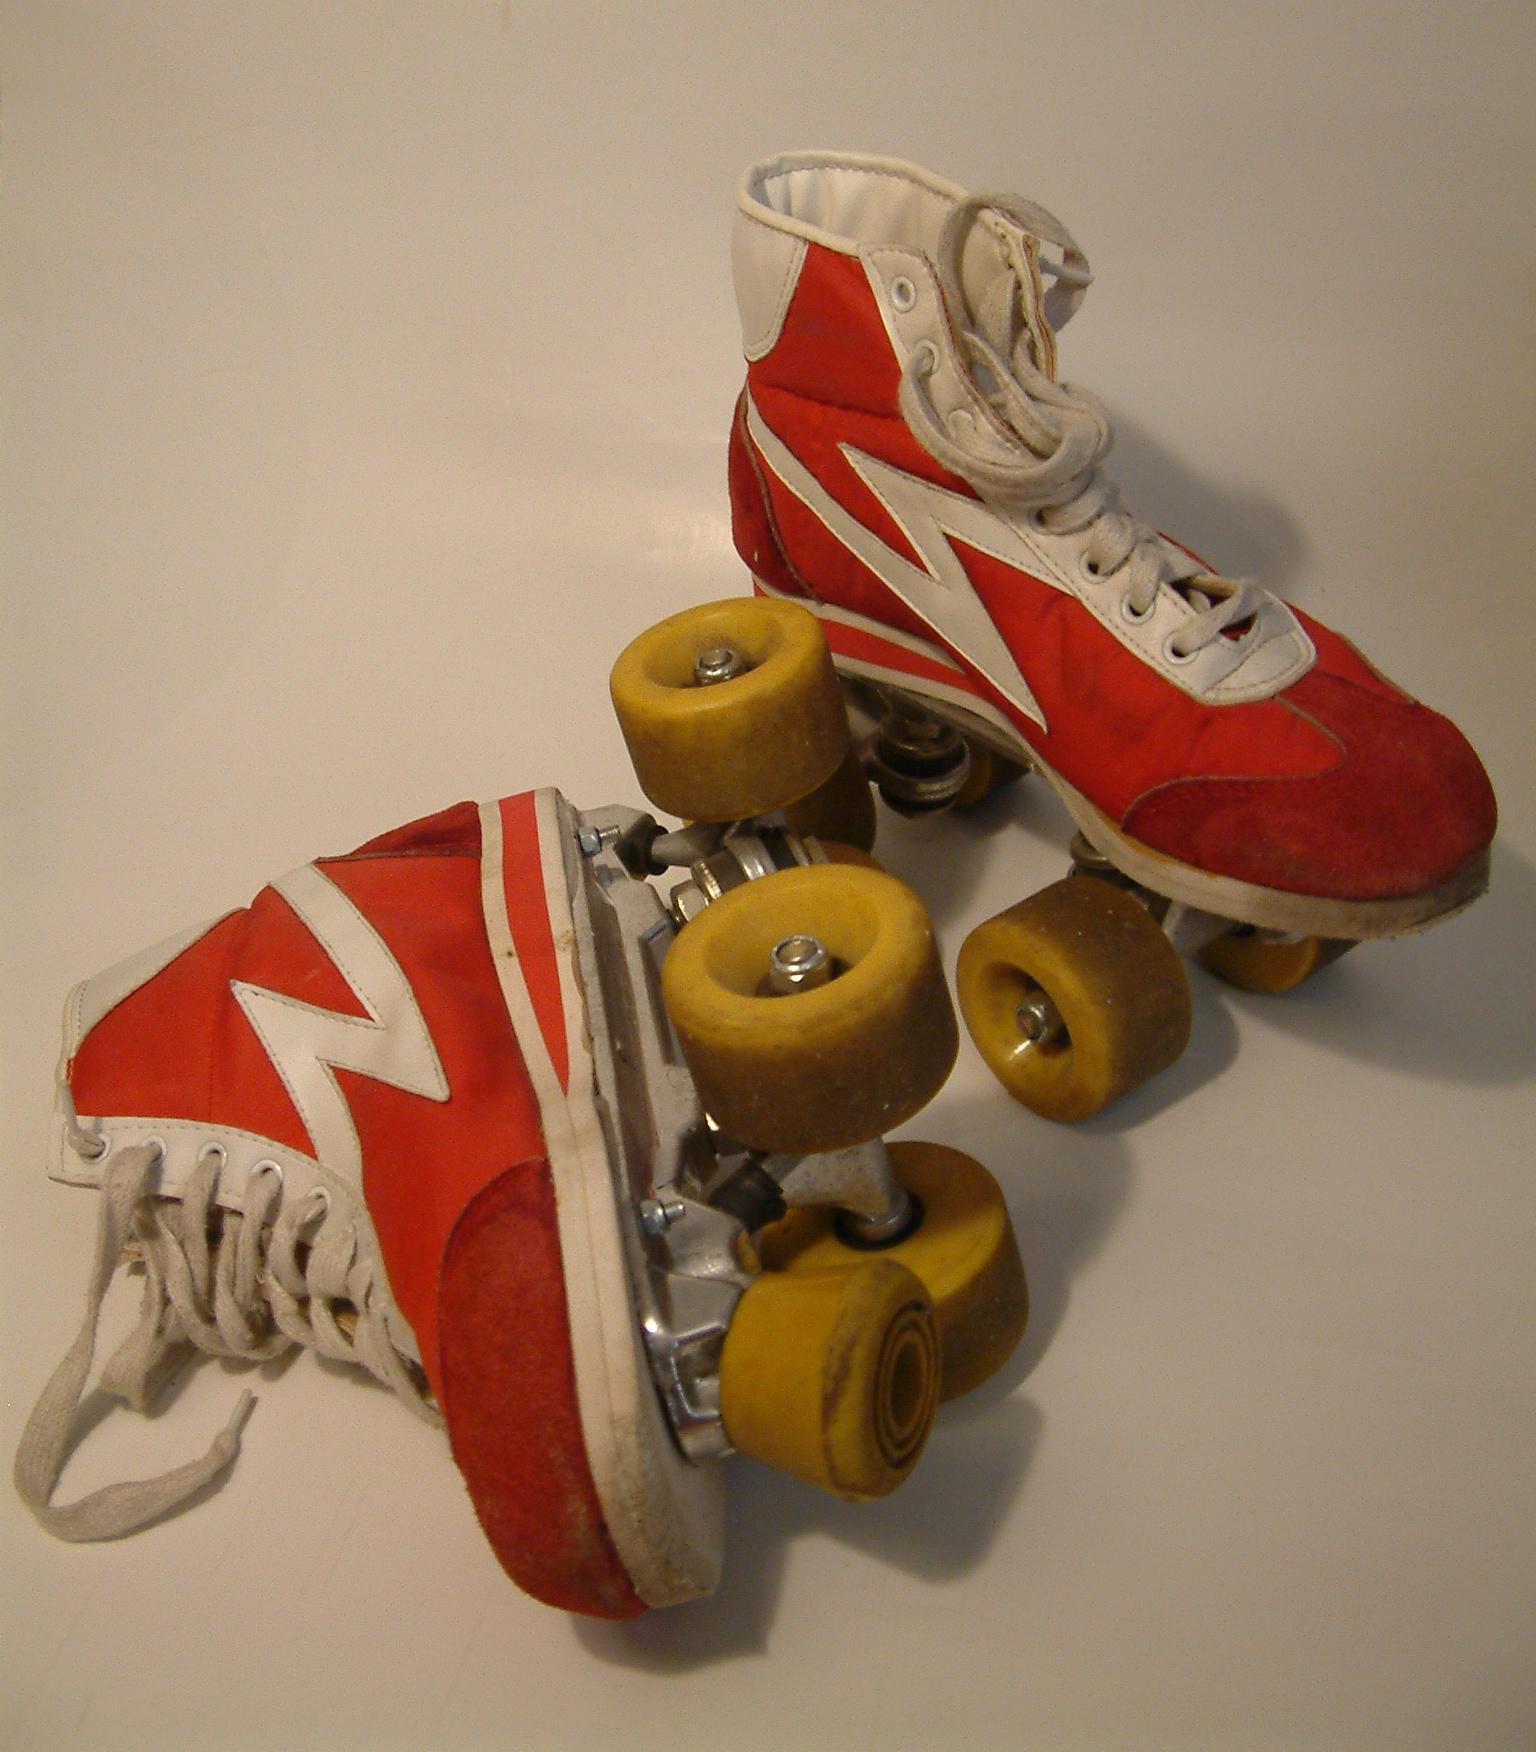 Roller skates stock-photo 3 by damnlife-stock